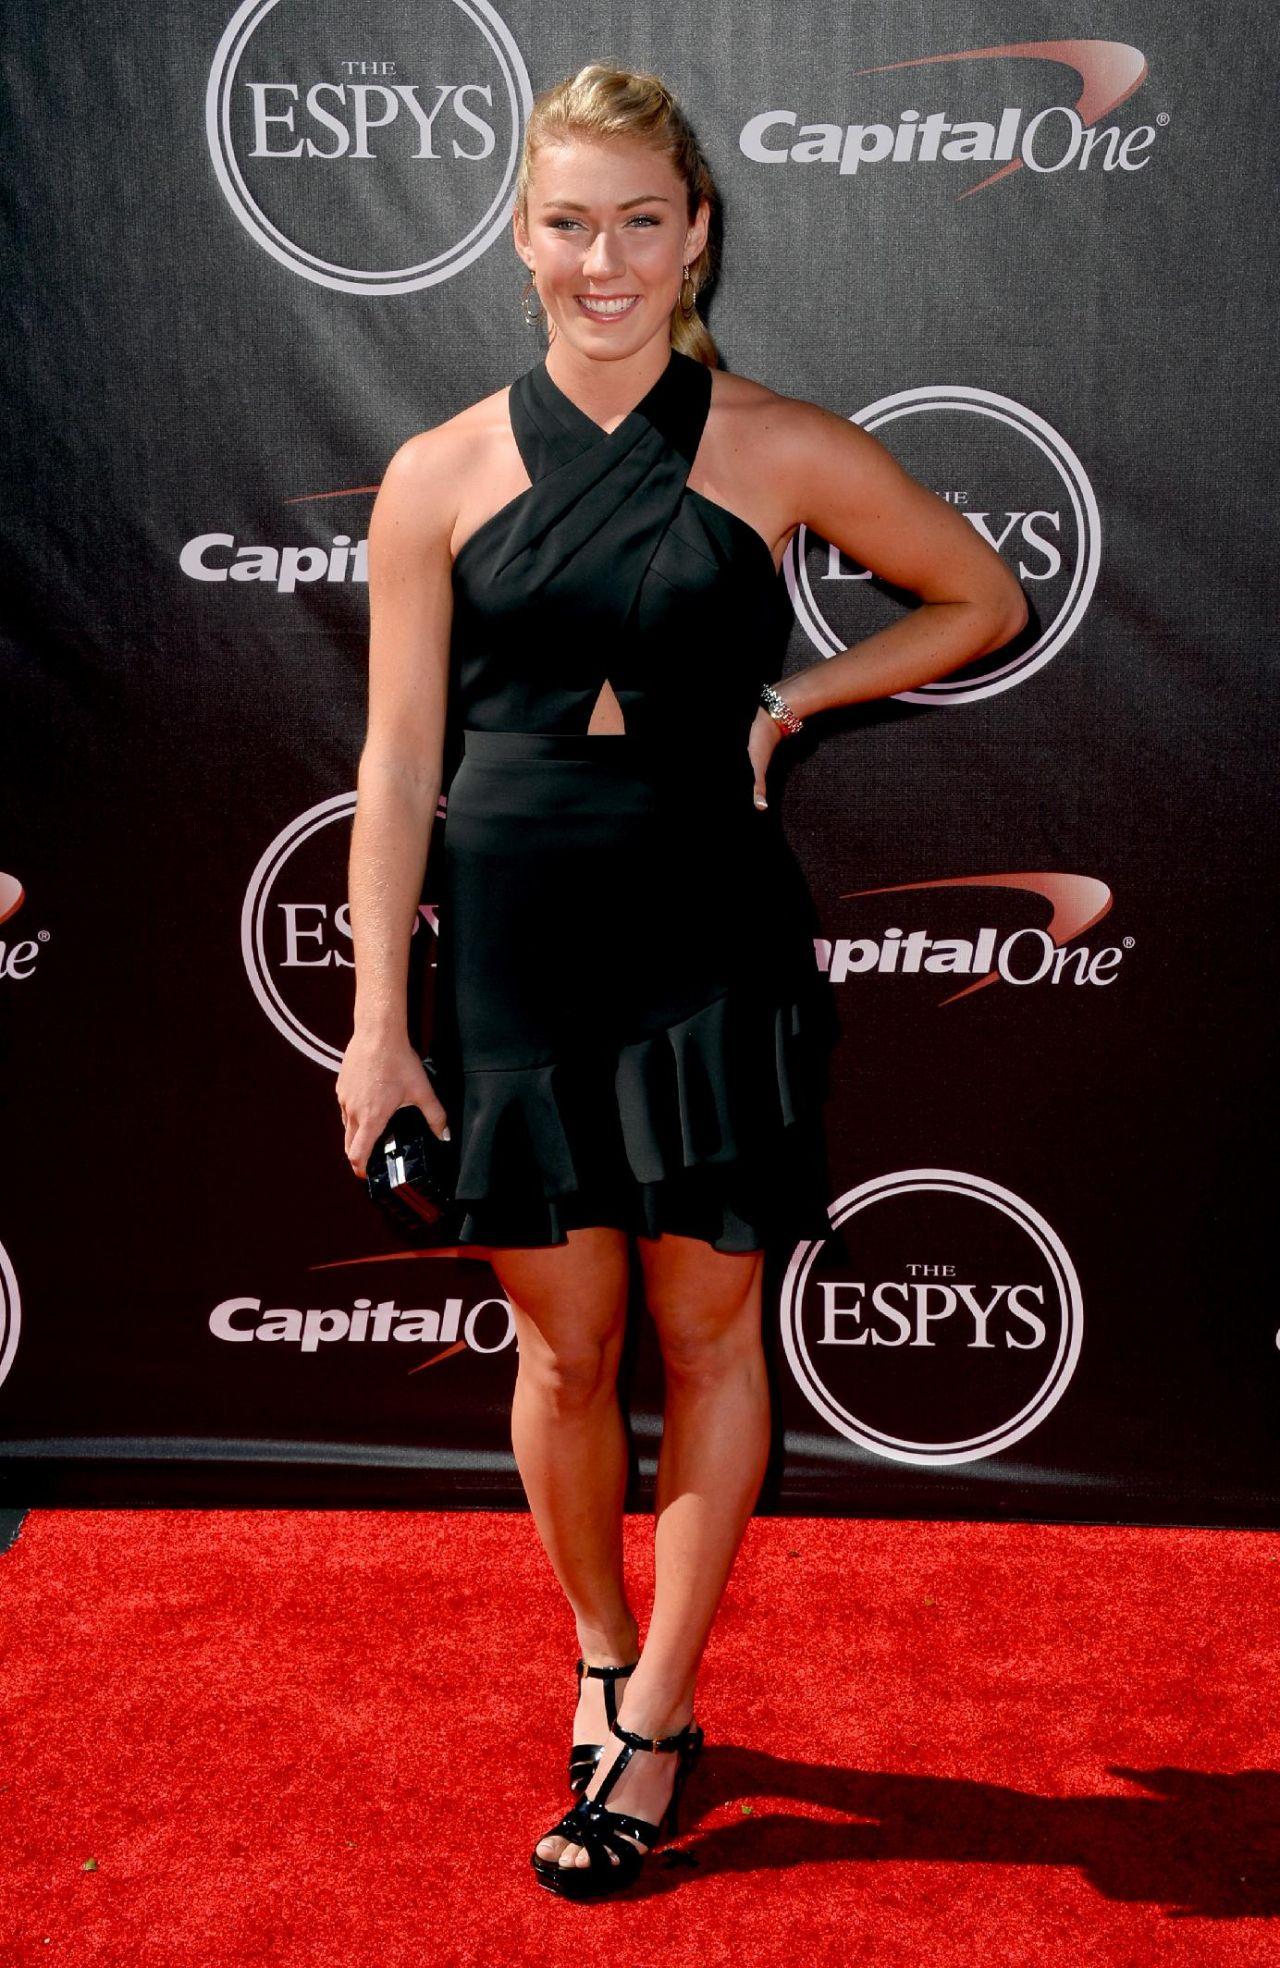 Mikaela Shiffrin Espy Awards 2014